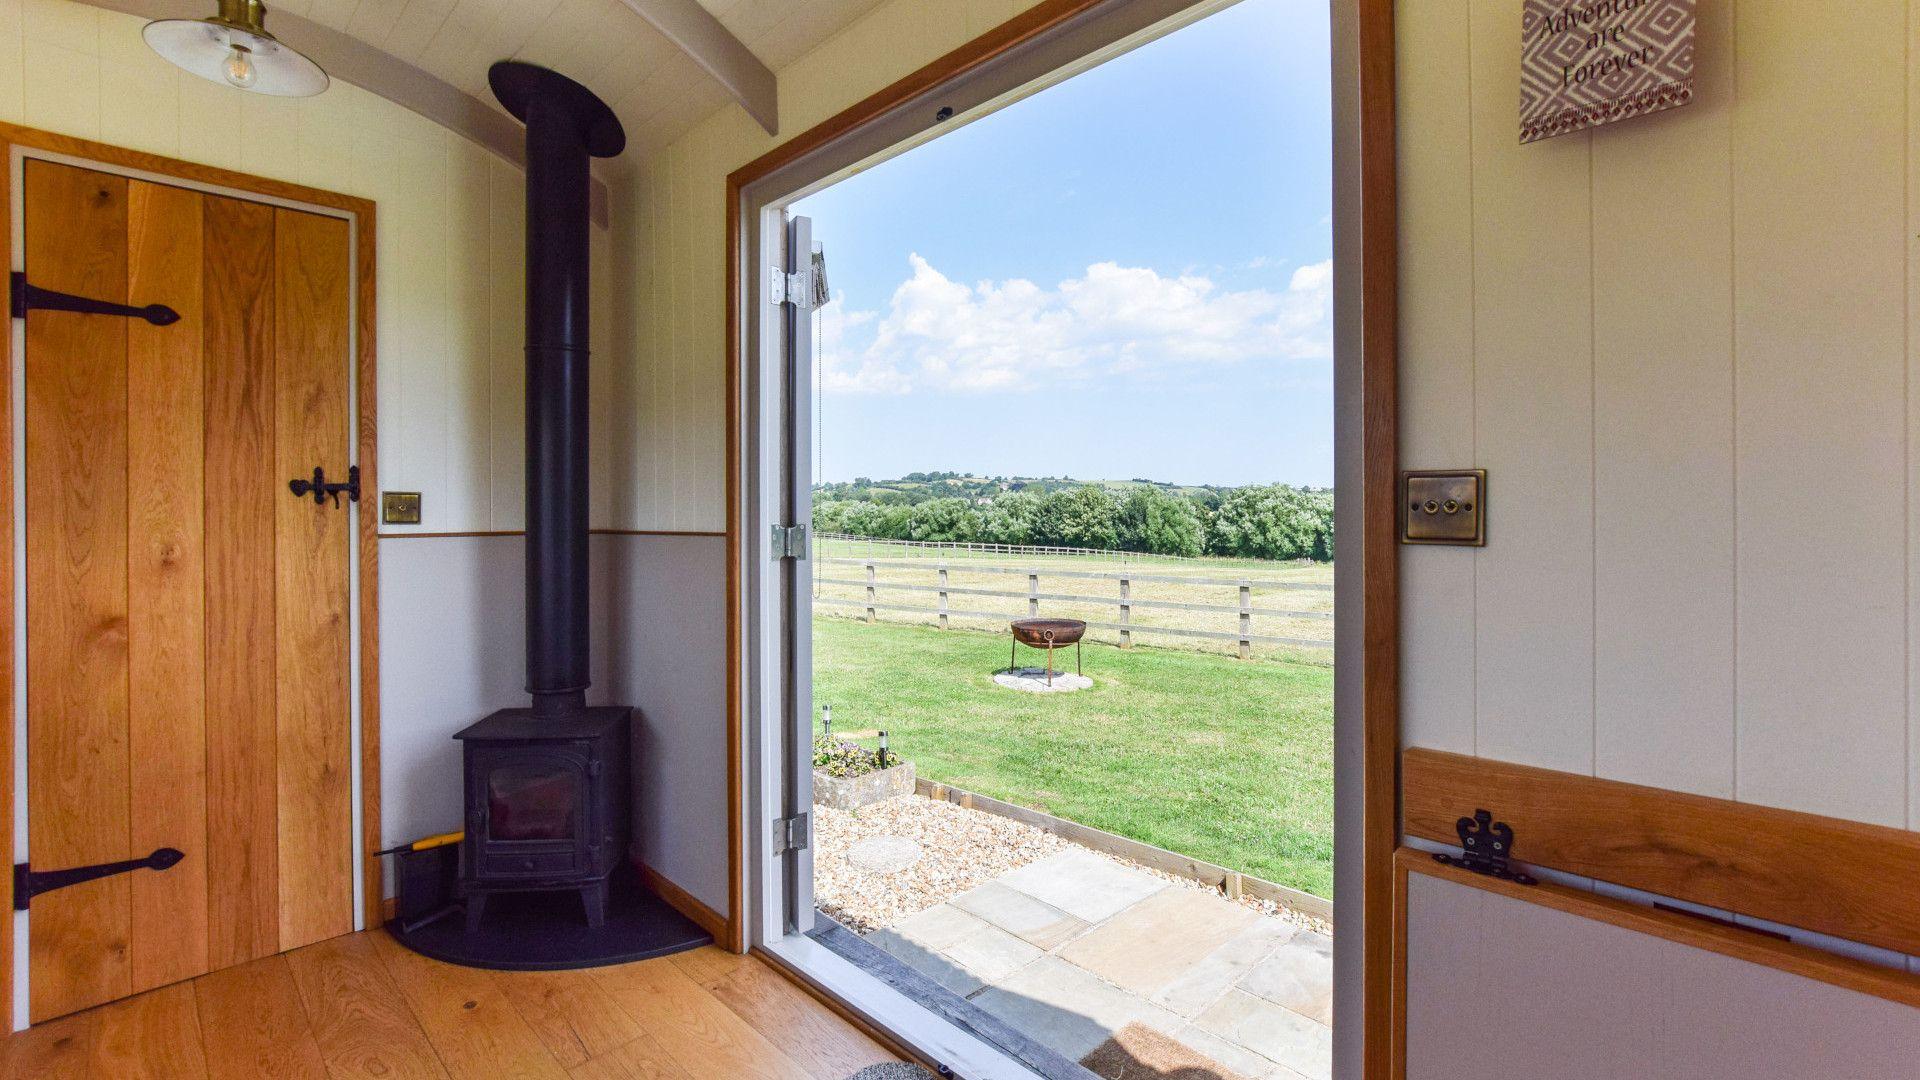 Hut with log burner, Shepherds Hut at Avon Farm, Bolthole Retreats